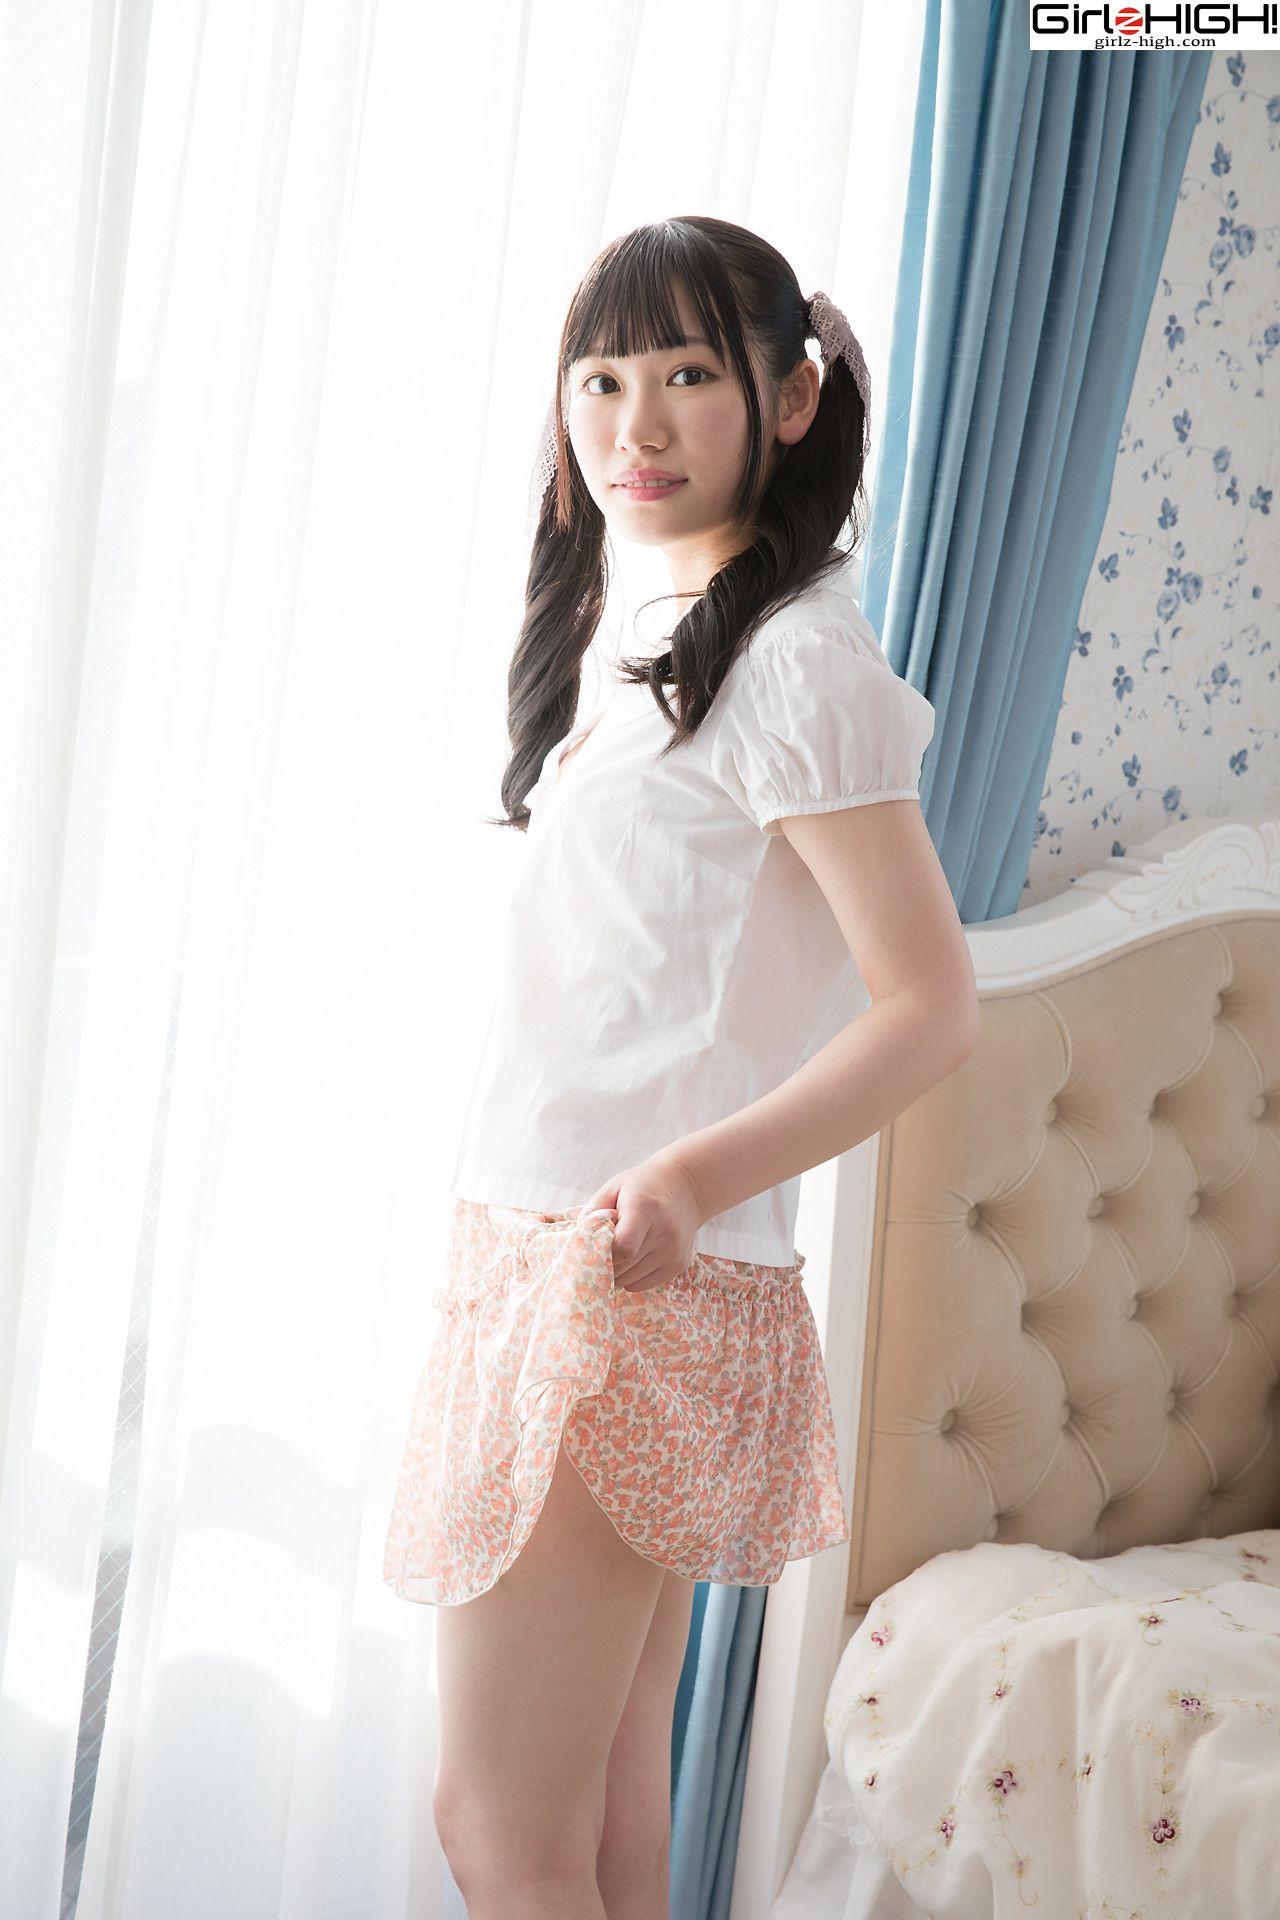 VOL.241 [Girlz-High]萌女双马尾:叶月彩菜(葉月彩菜)超高清写真套图(50P)